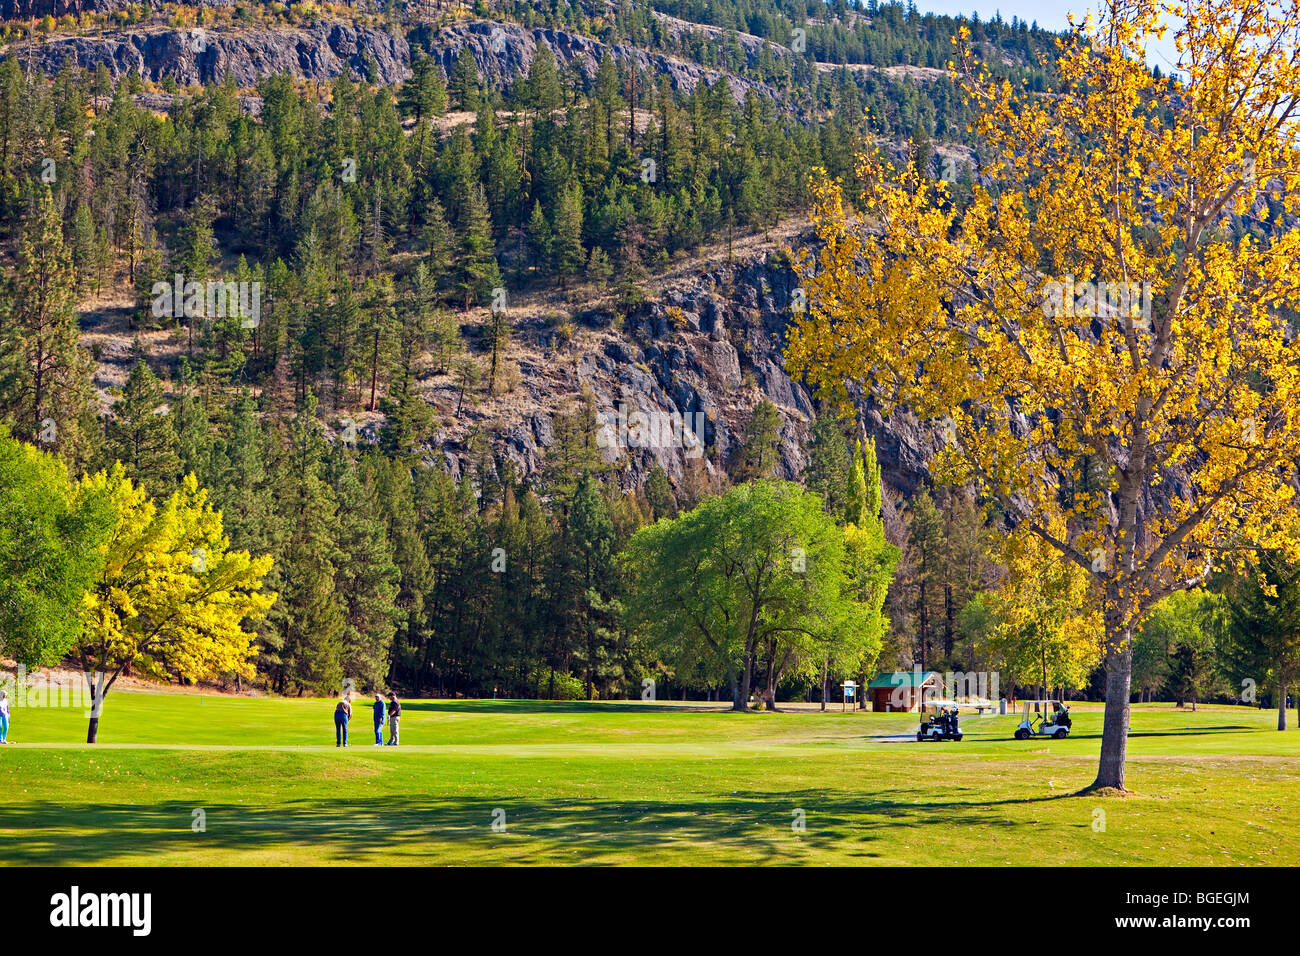 Twin Lakes Golf & RV Resort, Marron Valley, Highway 3A, Okanagan-Similkameen Region, Okanagan, British Columbia, - Stock Image